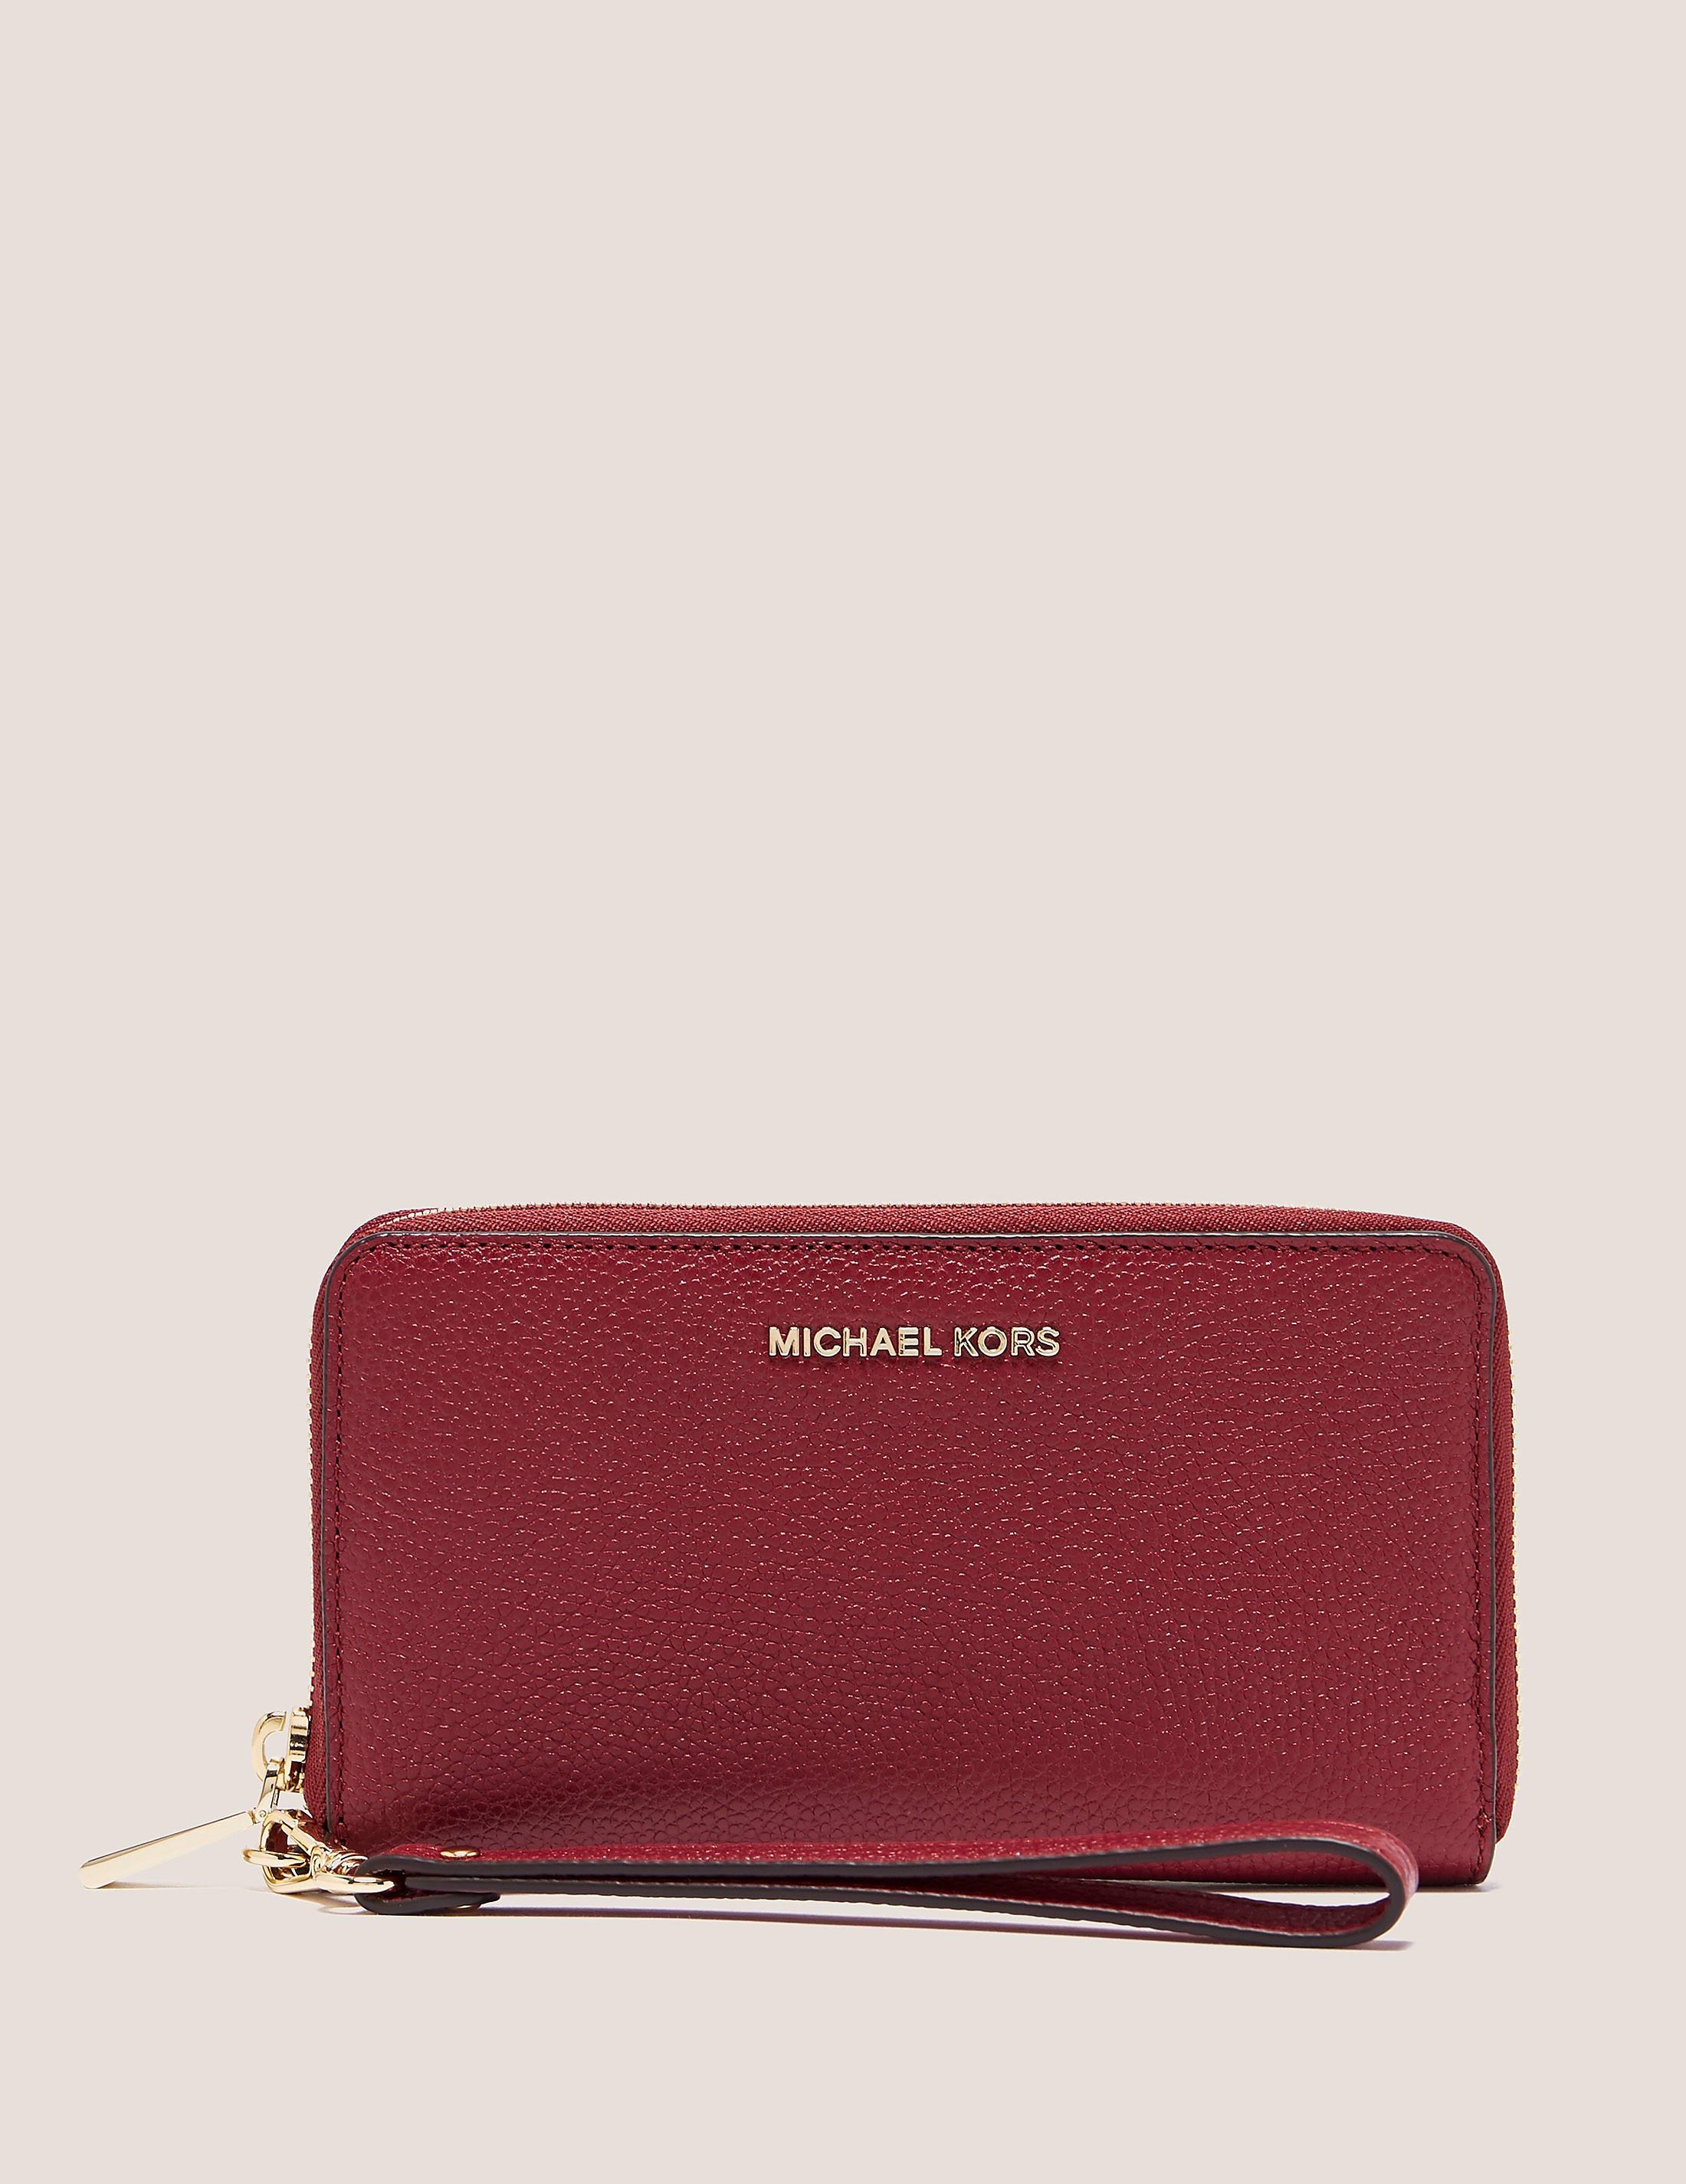 Michael Kors Large Phonecase Wristlet